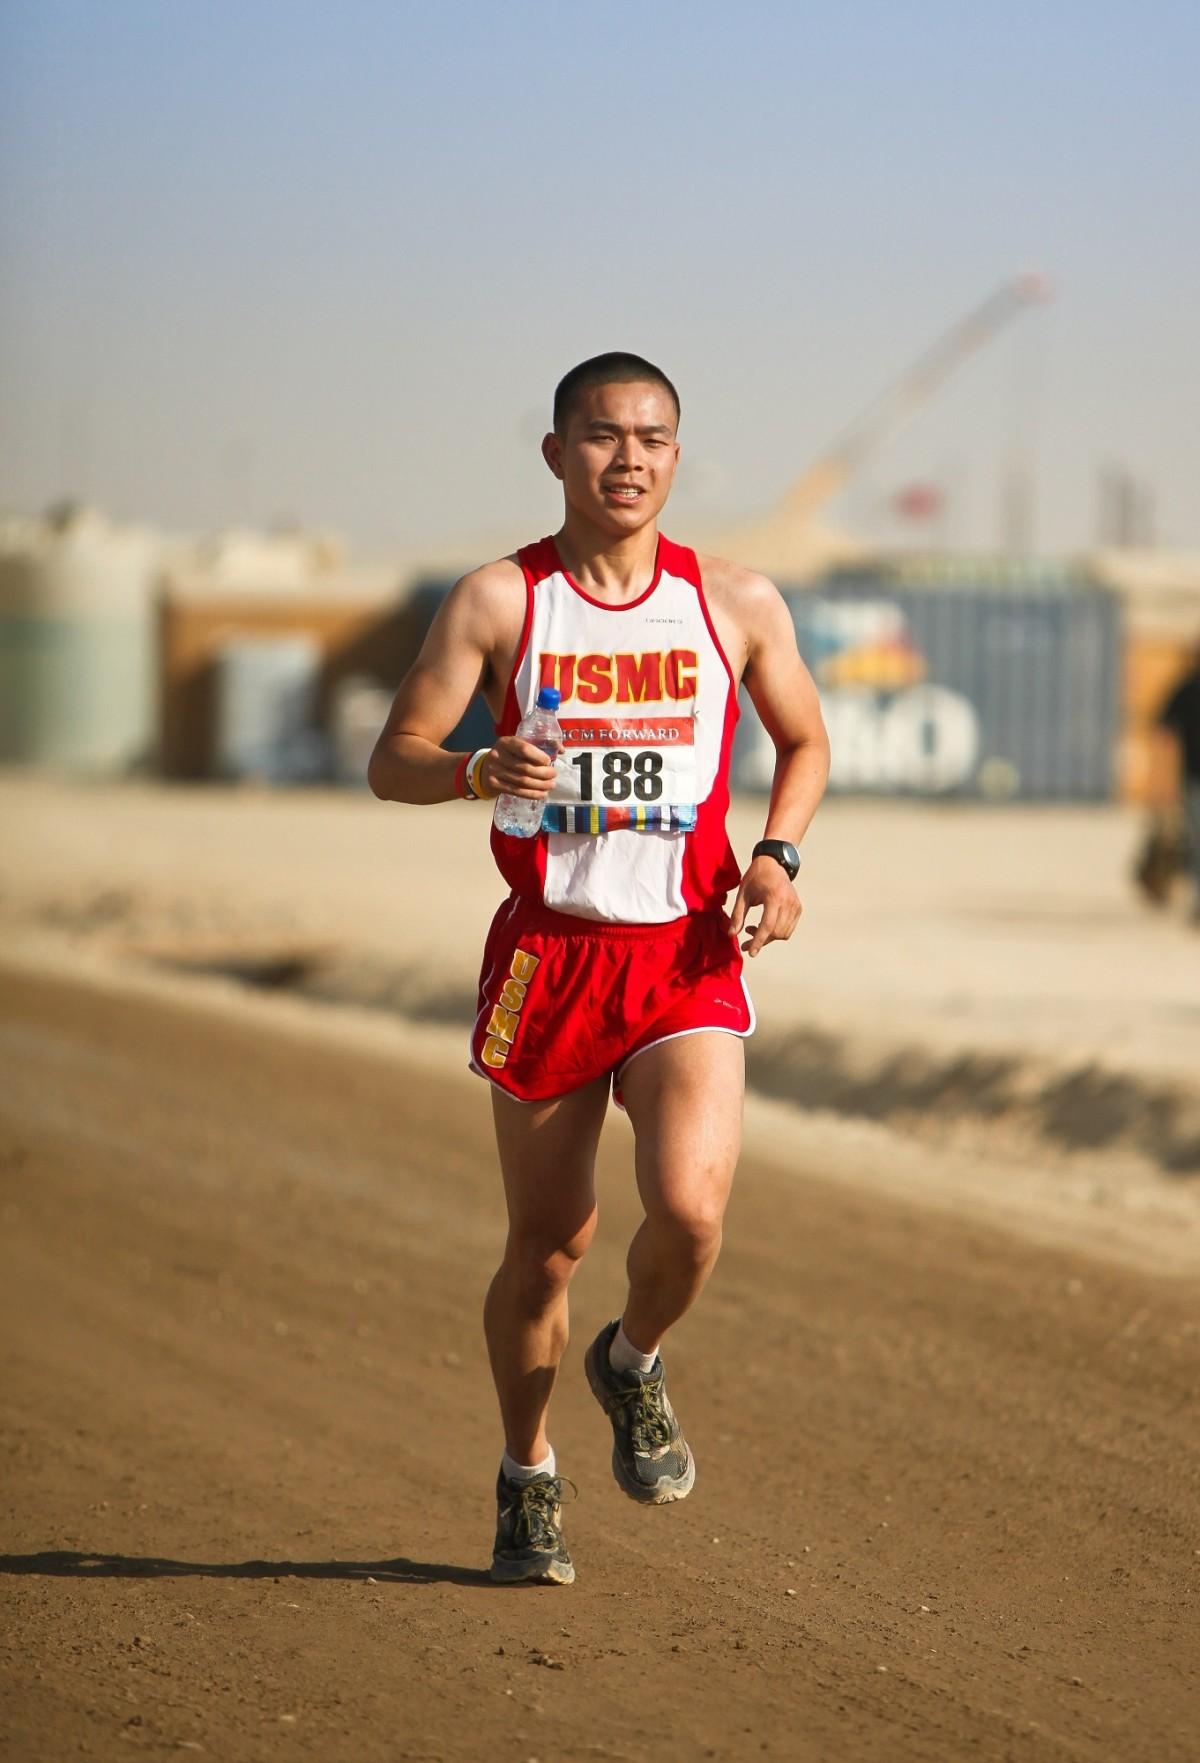 Sport Man Running Runner Sprinting Training Stock Photo ... |Marathon Man Running